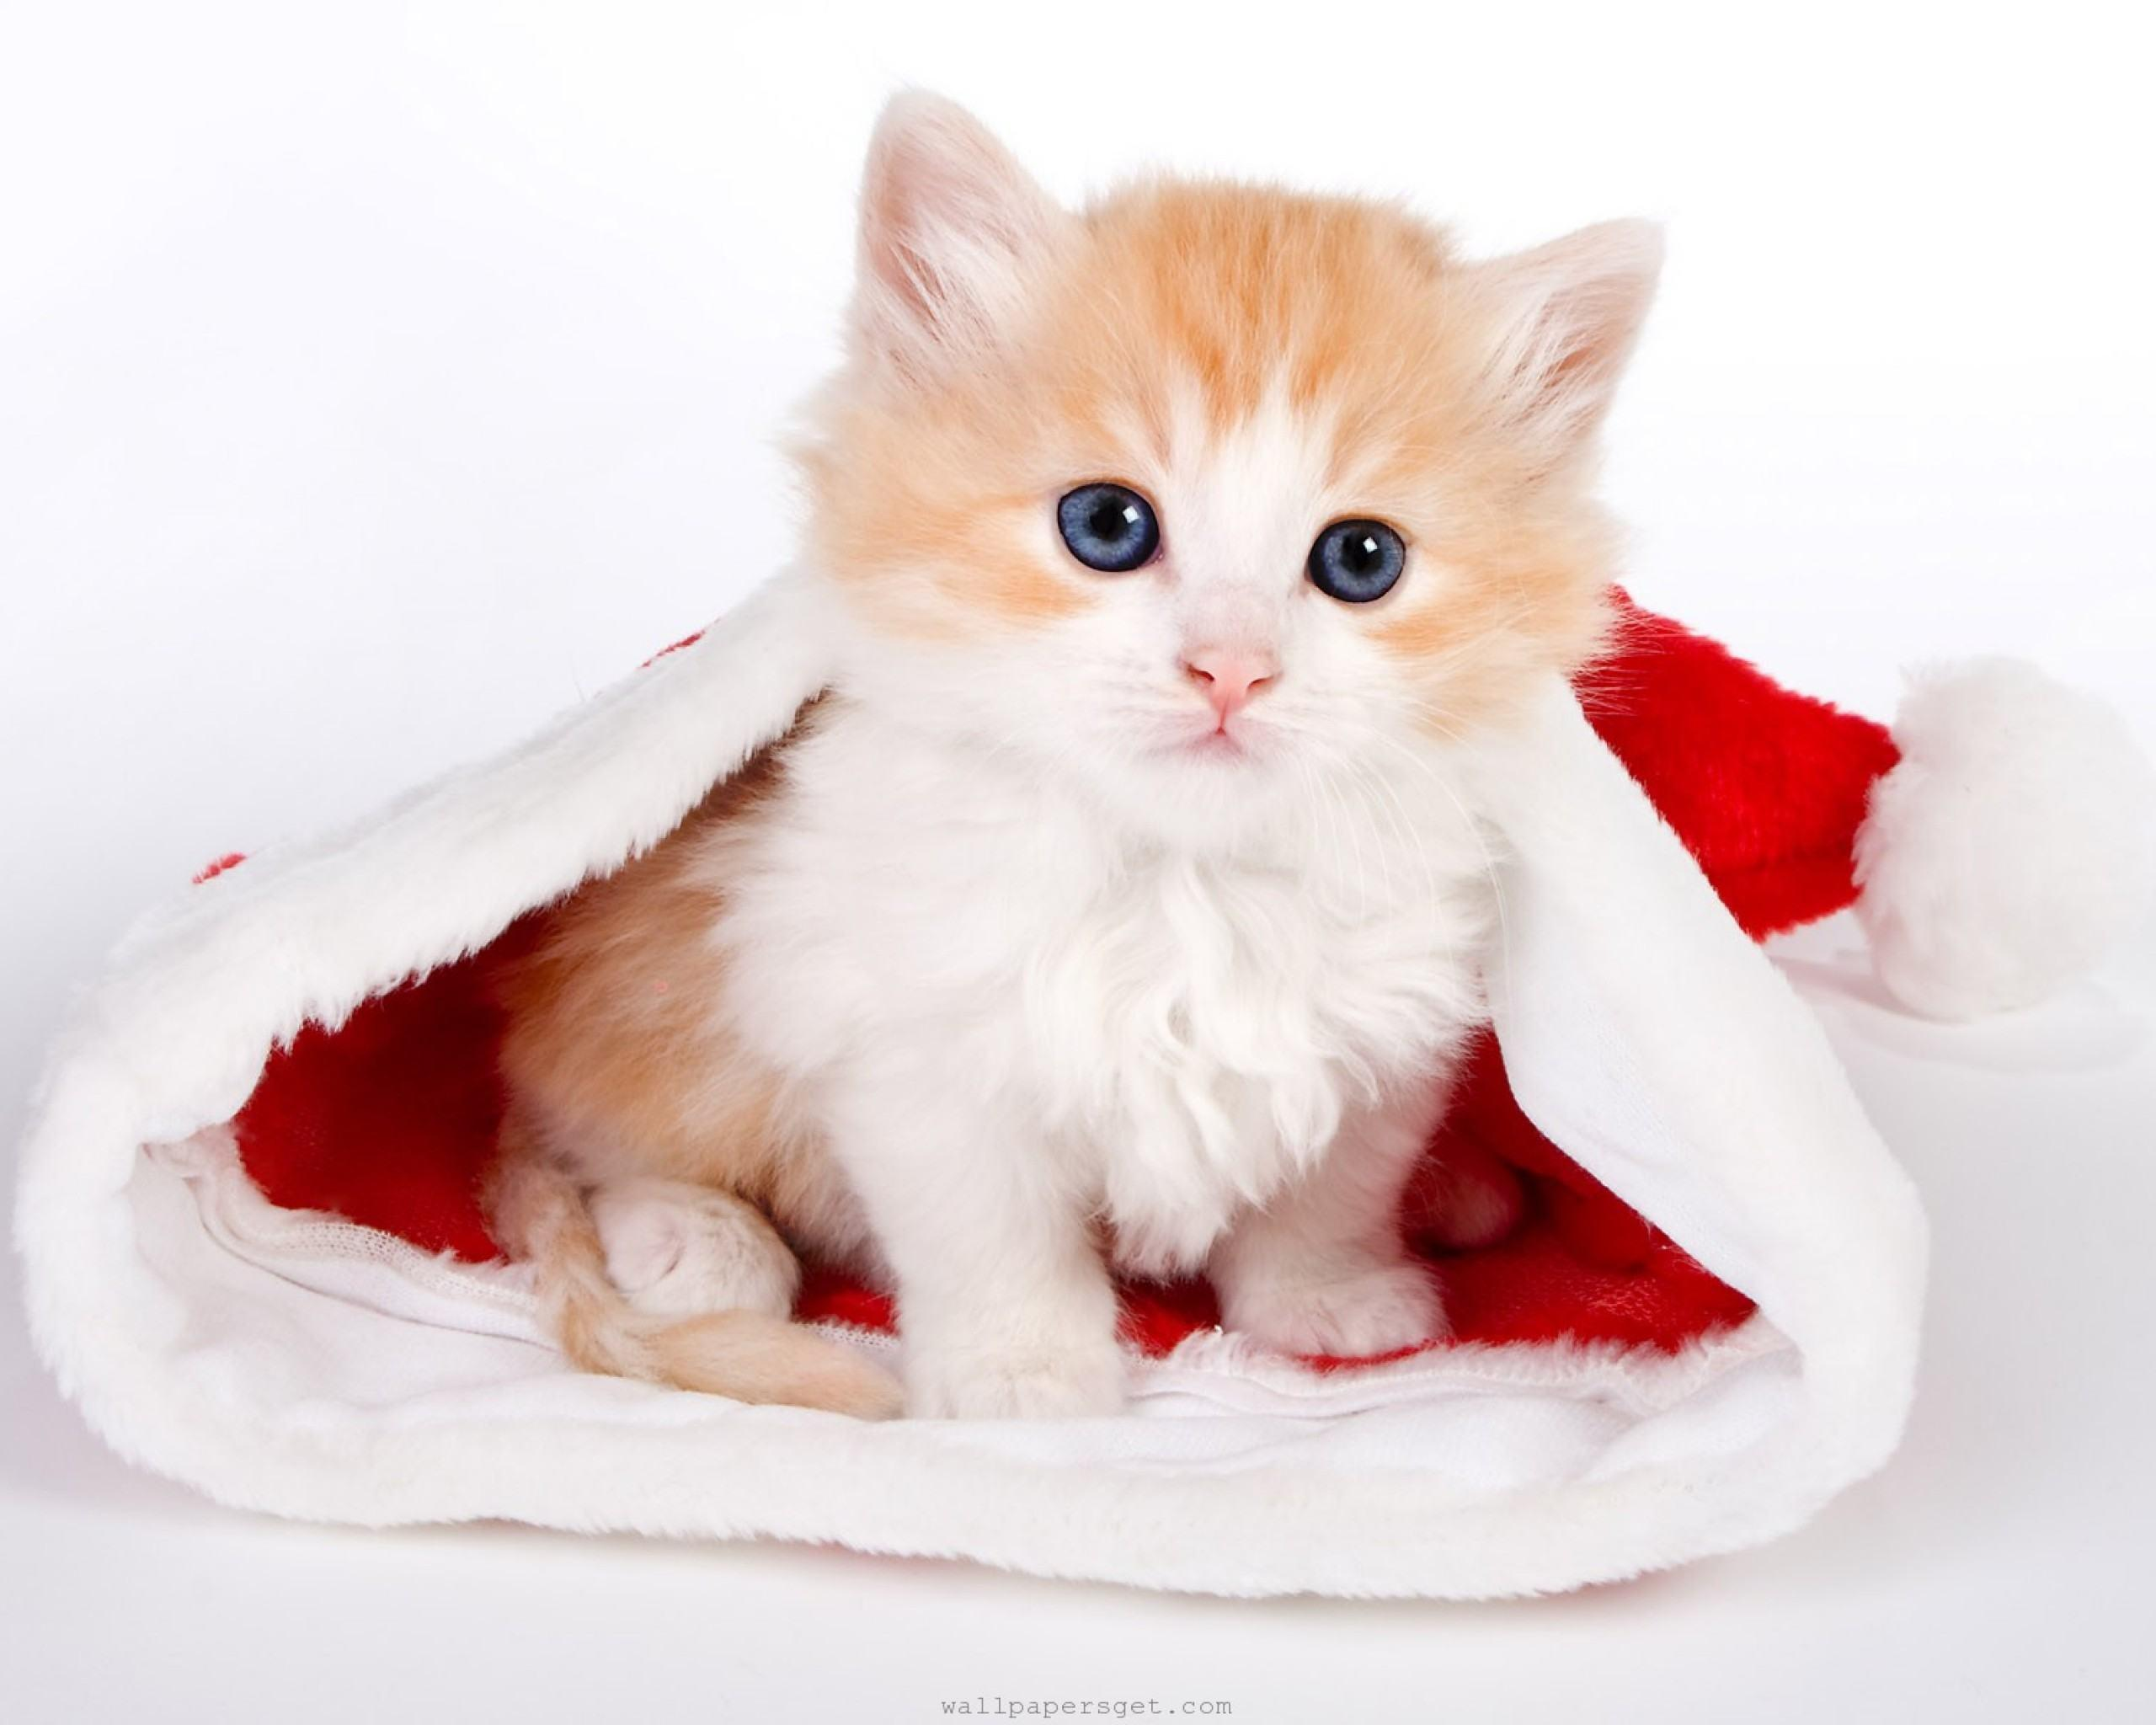 Funny Cat Animal Love Cute Precious Hd Wallpapers